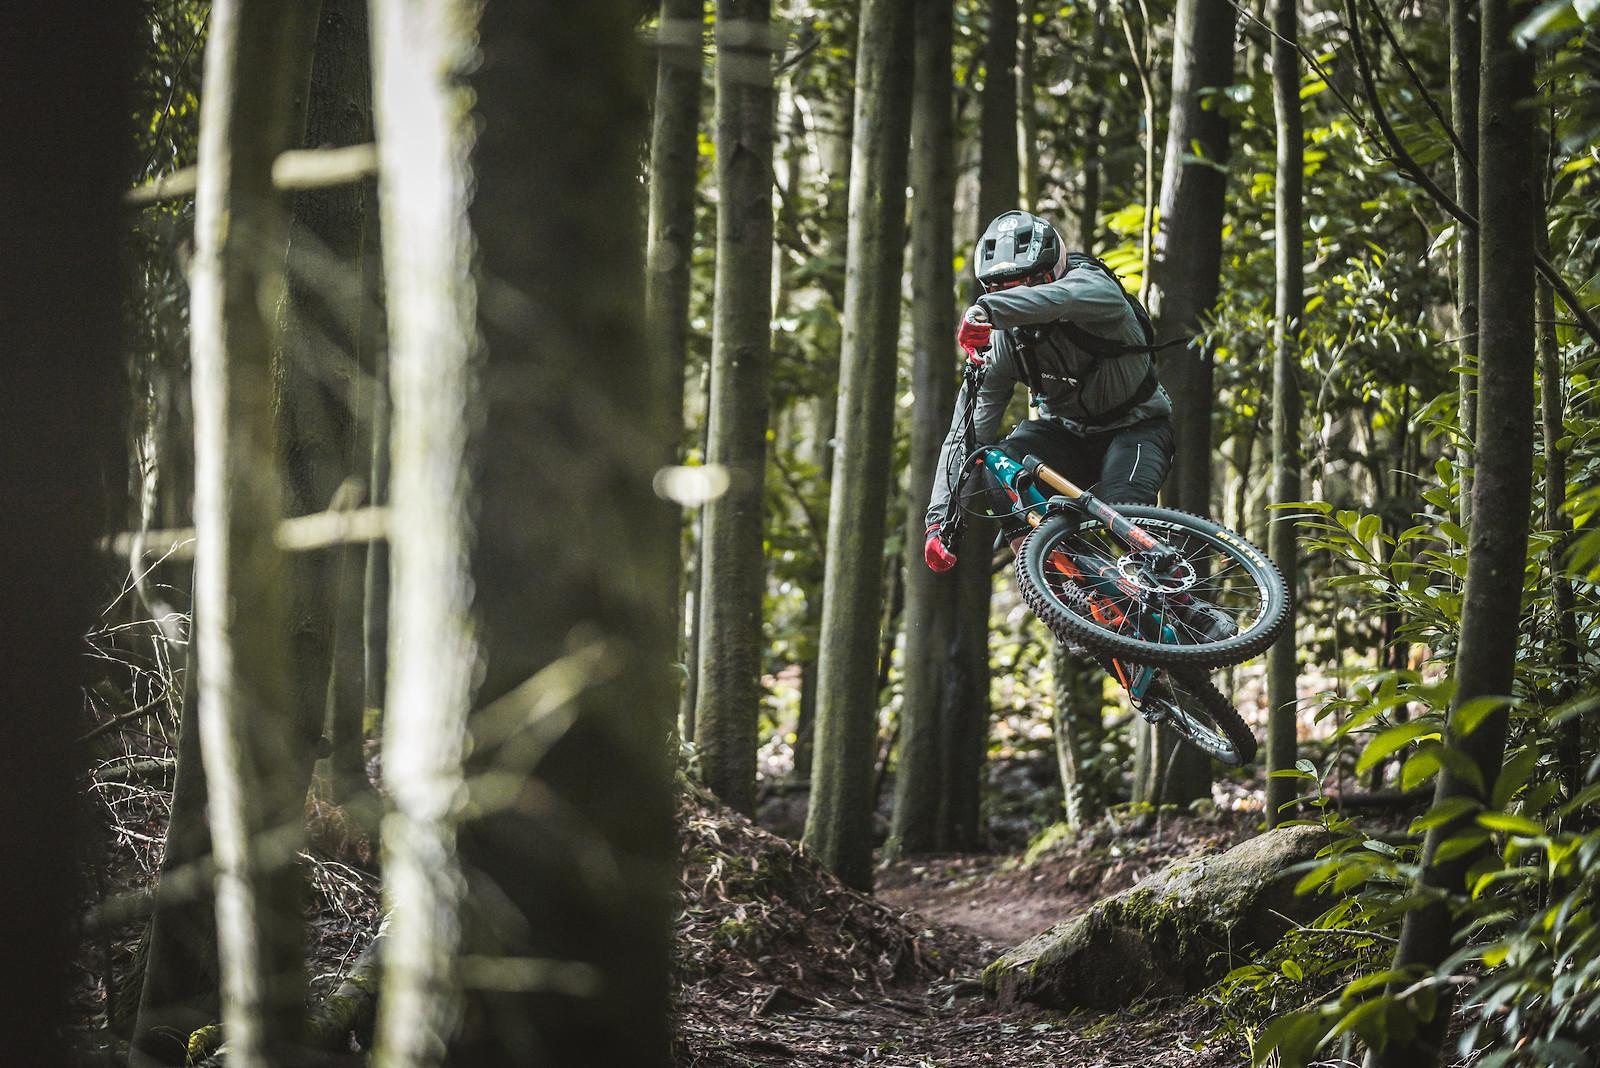 11E37038-BBB0-4604-8A34-3FEAFA9FE052 - Henrique_Monteiro - Mountain Biking Pictures - Vital MTB